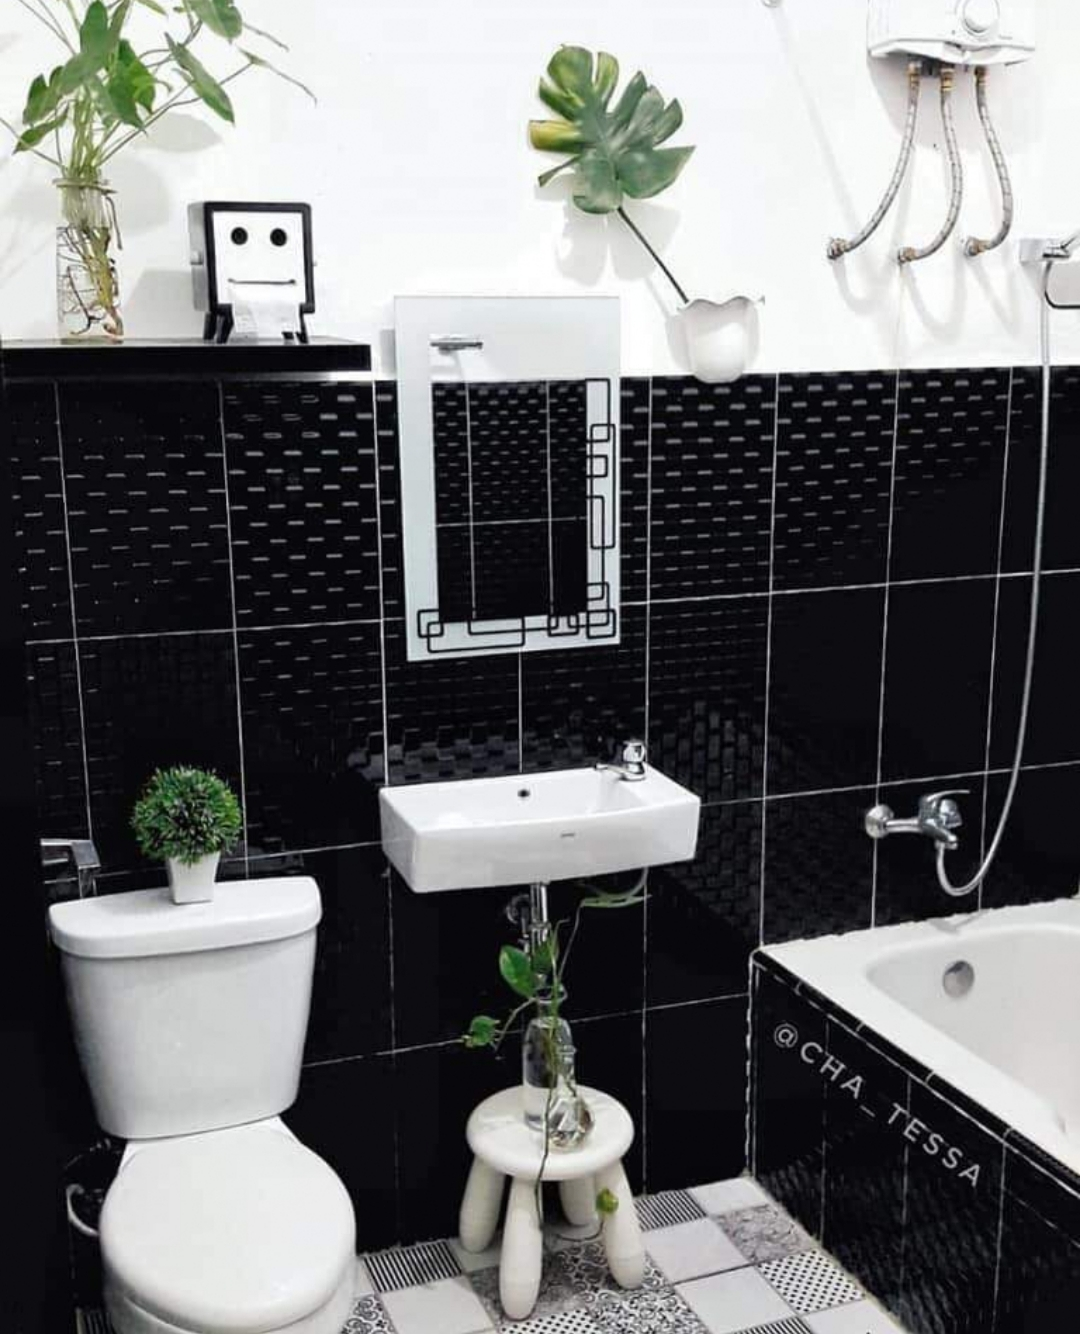 Dekorasi Toilet Kecik Tapi Cantik